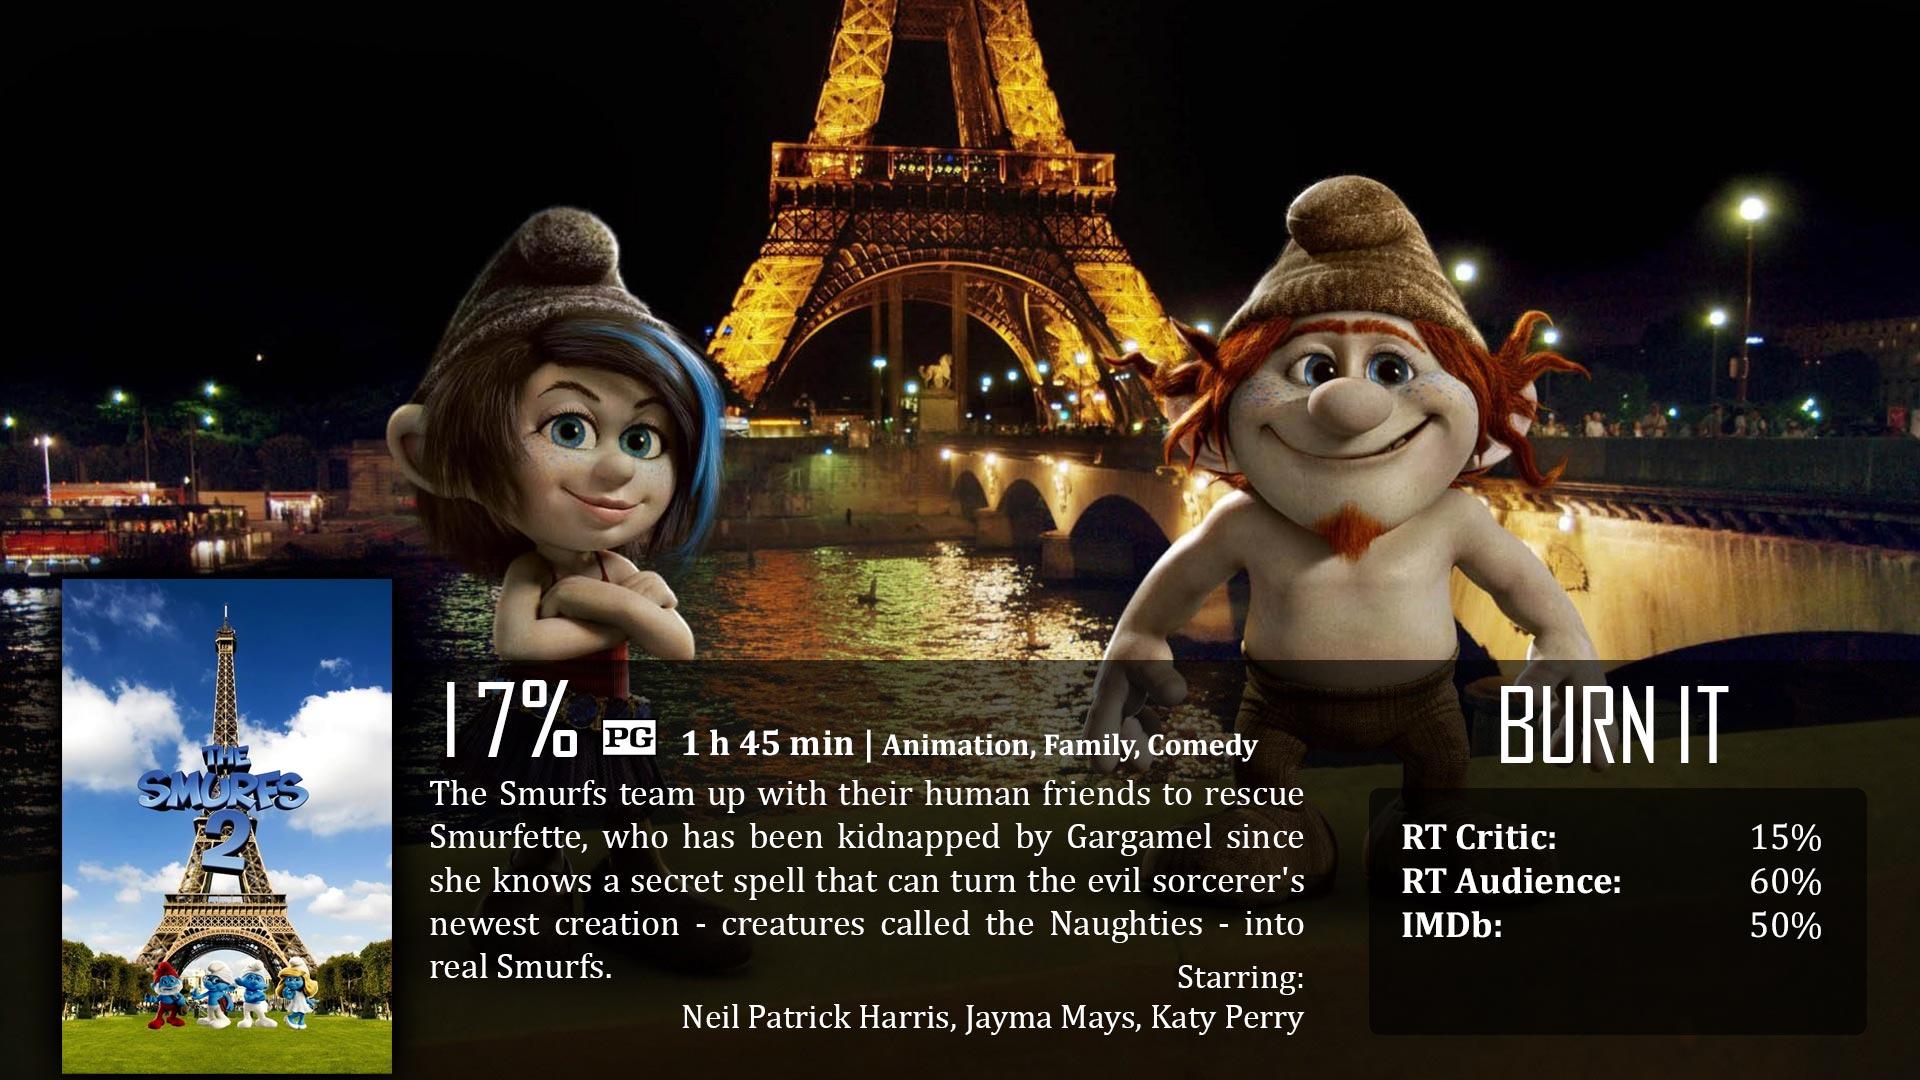 the smurfs 2 (2013) – dave examines movies